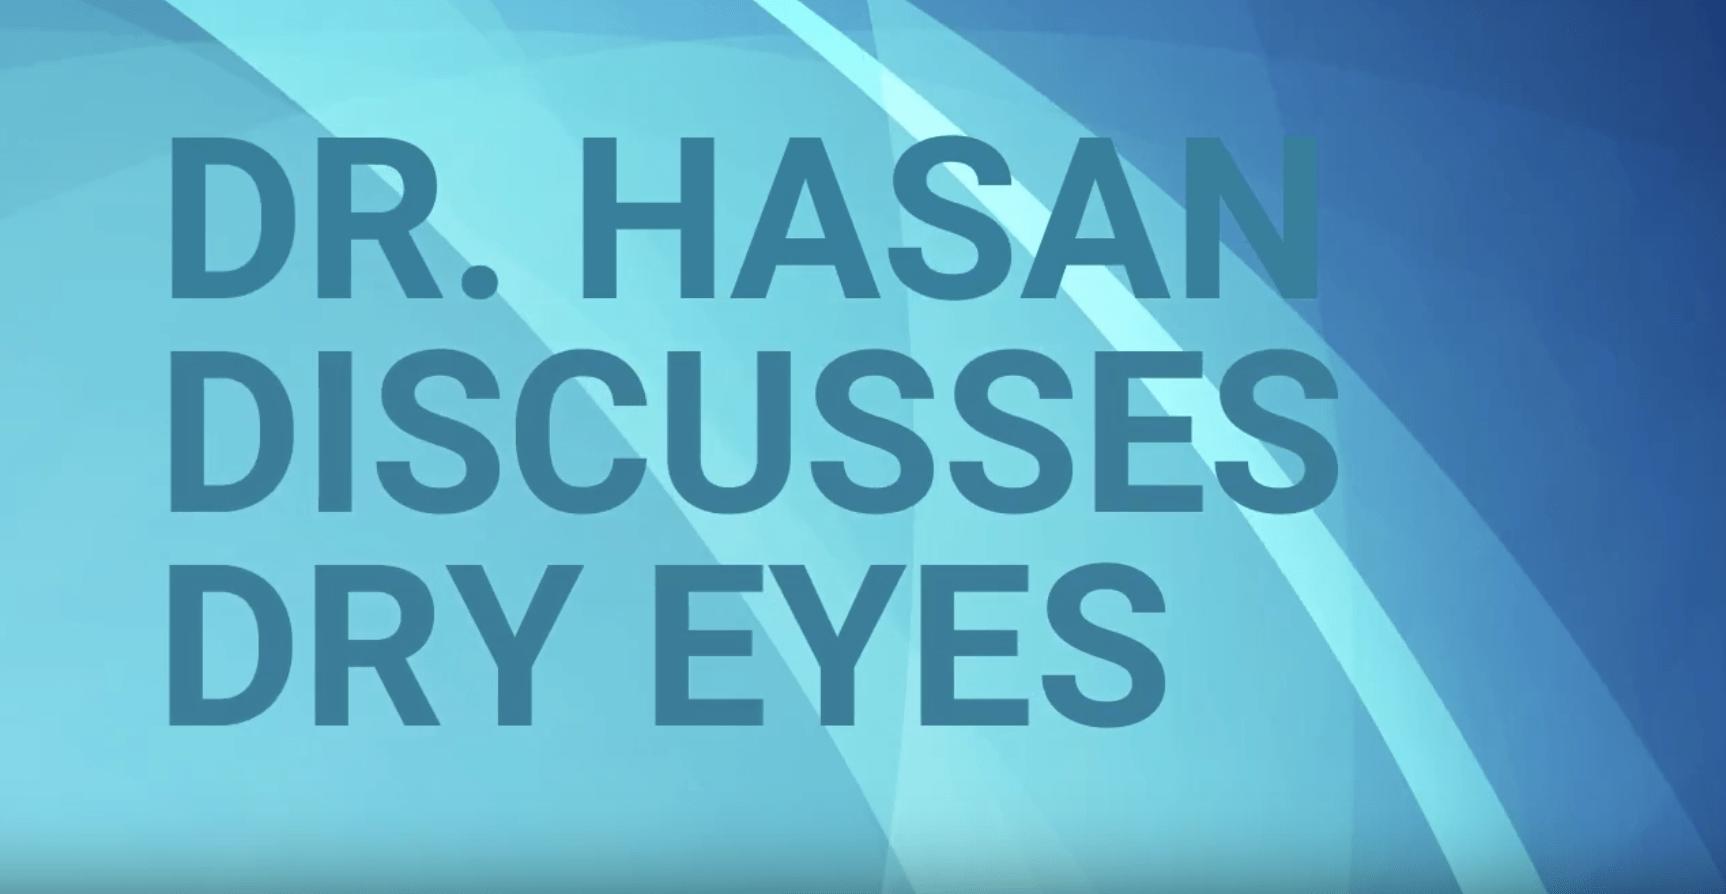 Dr. Hasan Talks Dry Eyes